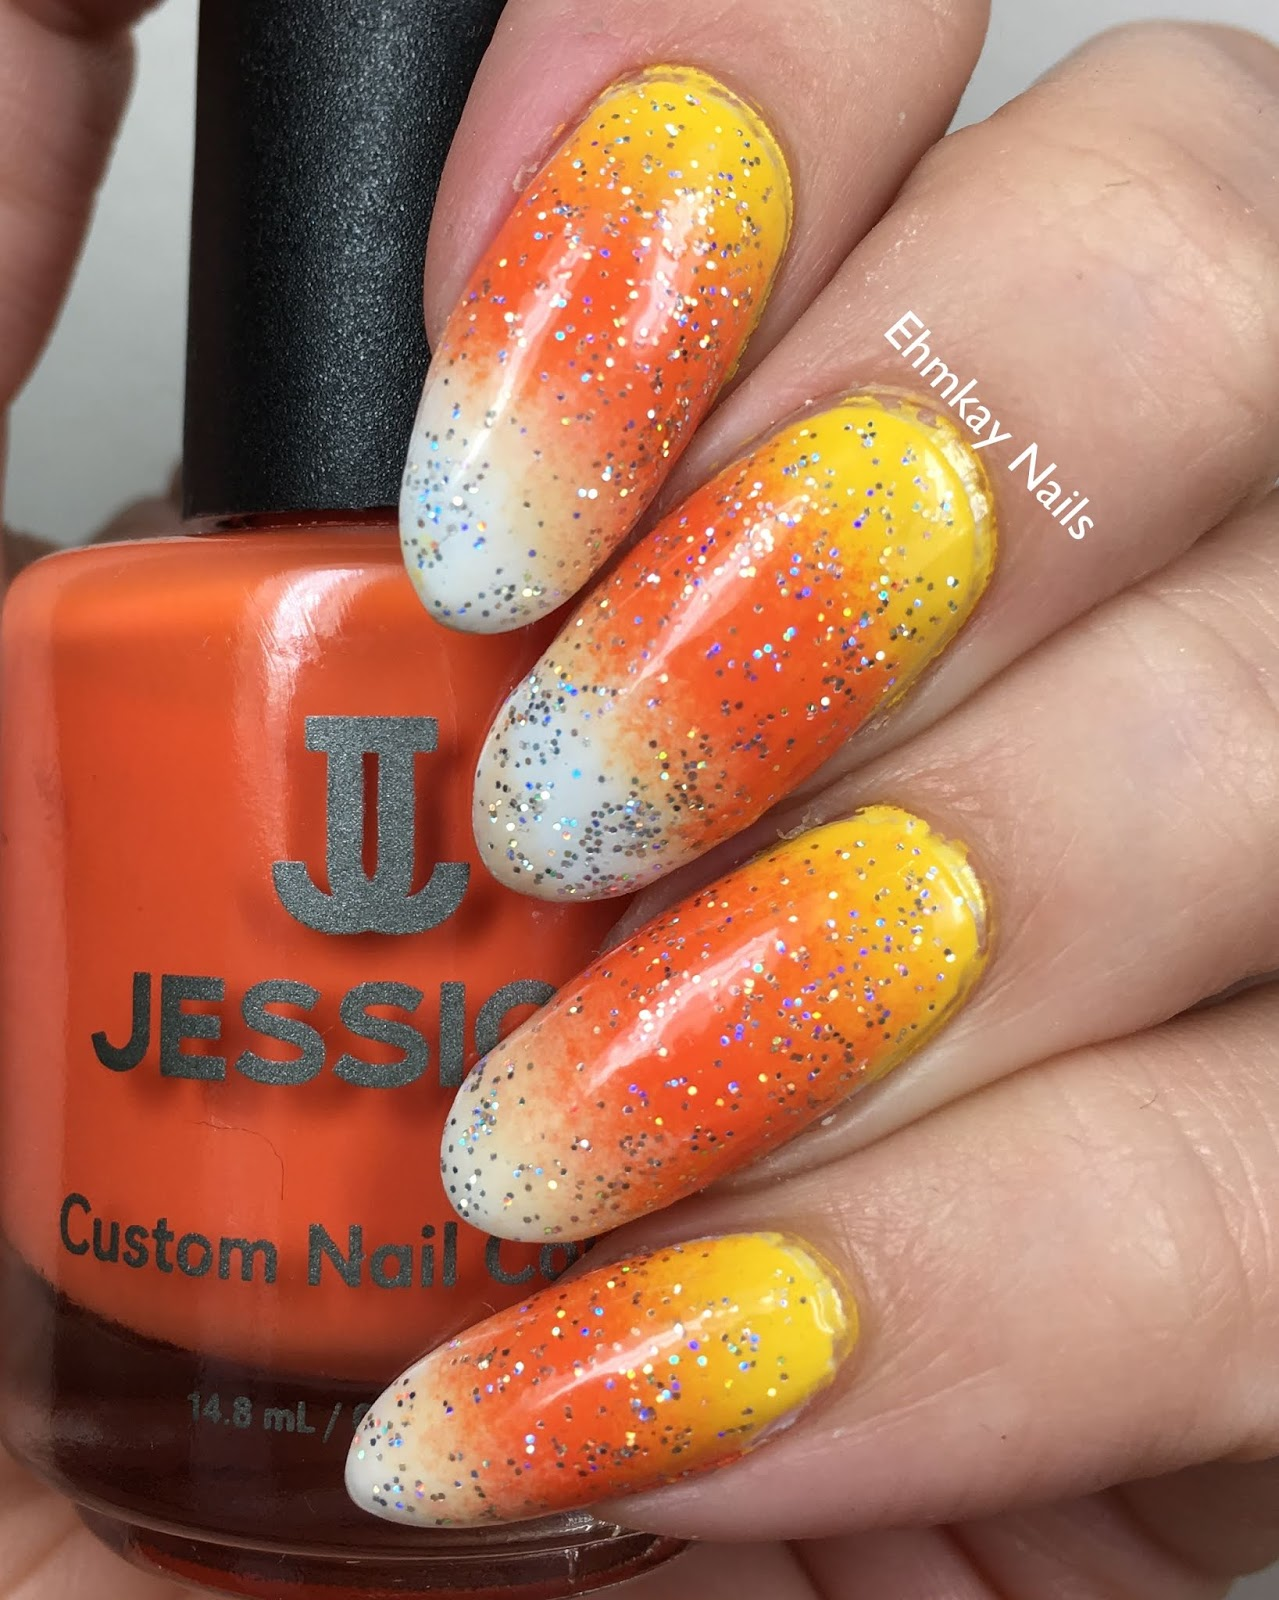 ehmkay nails: 13 Days of Halloween: Candy Corn Nail Art